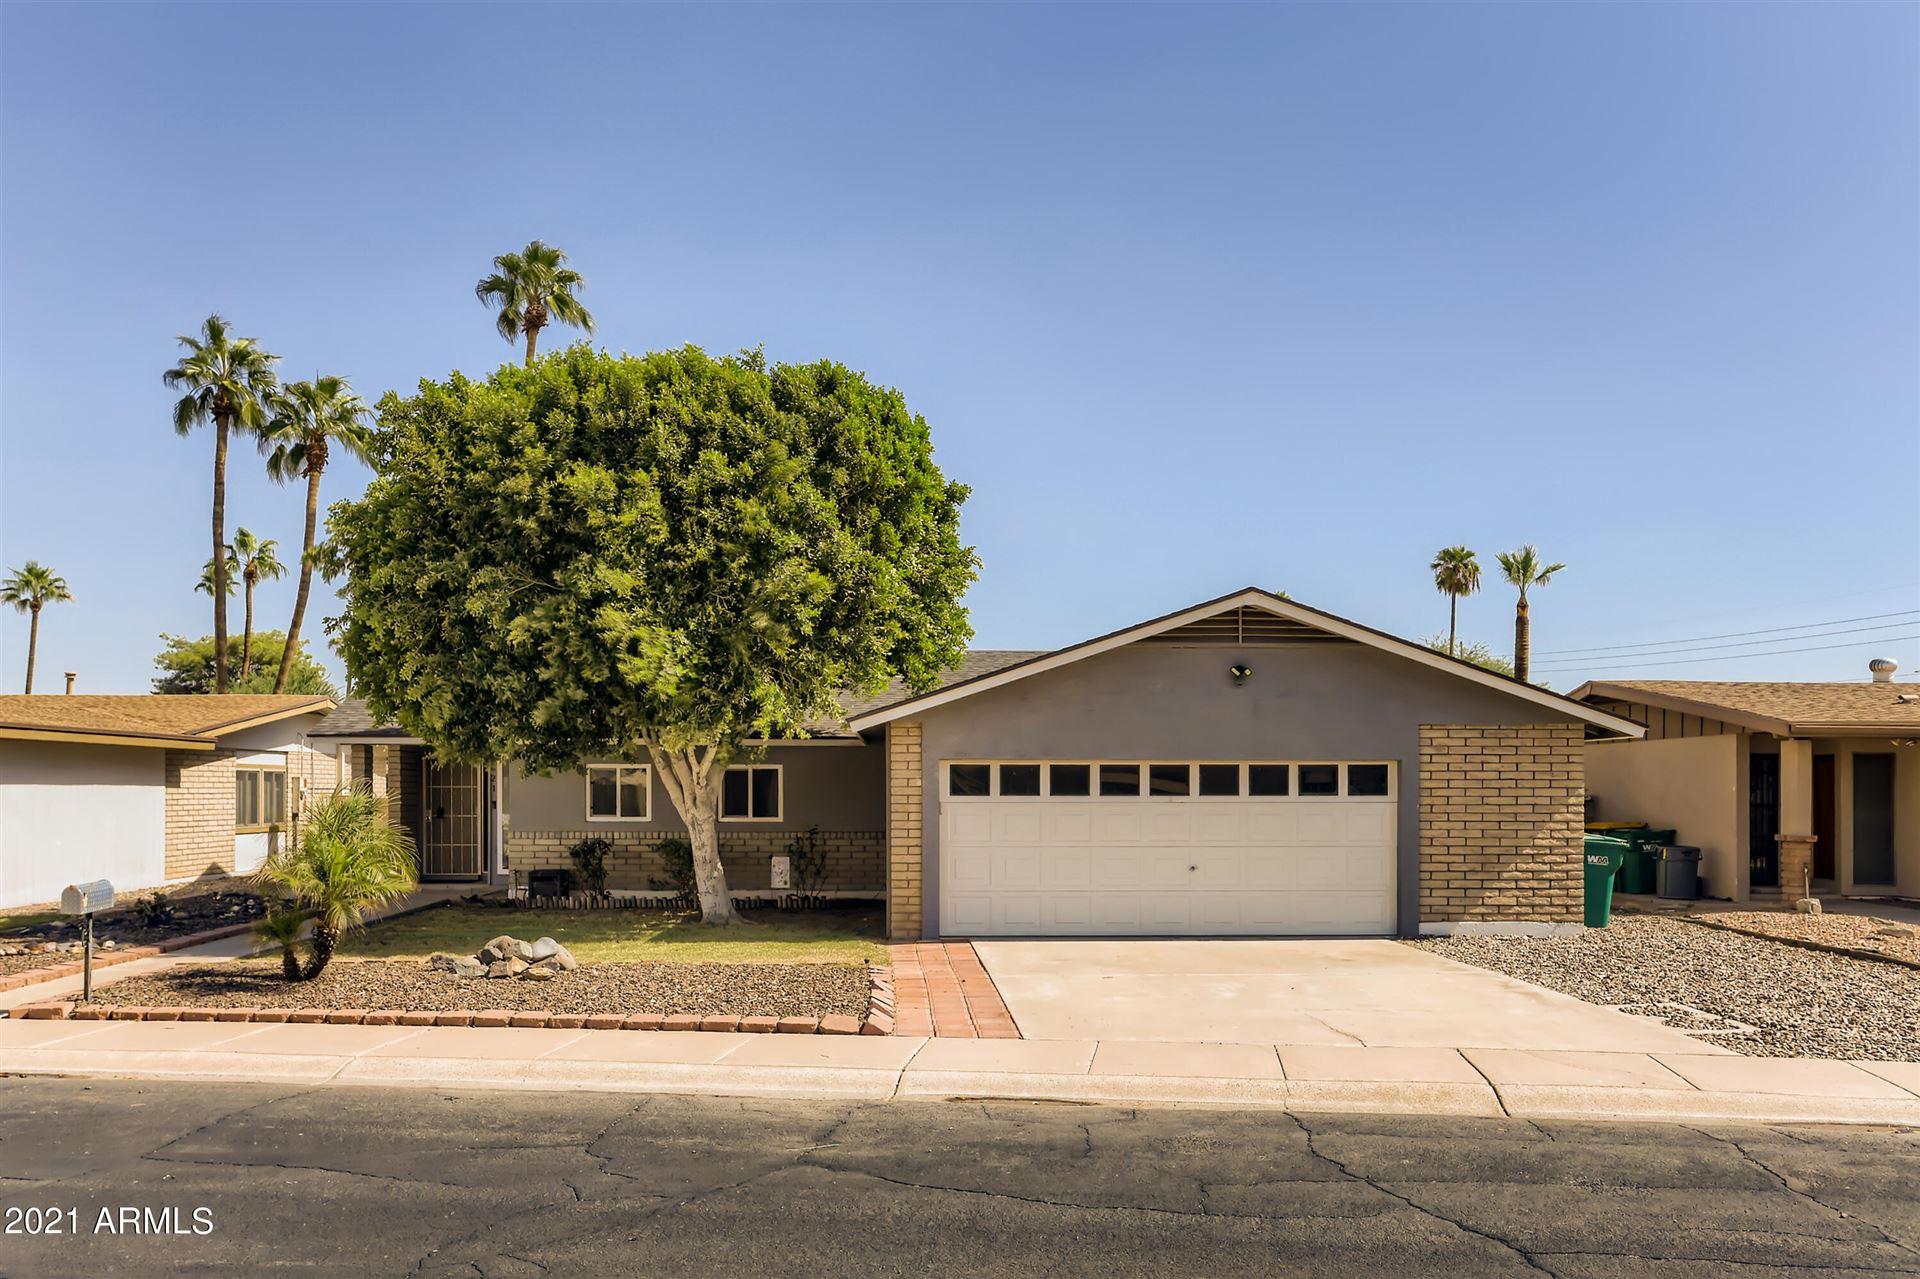 Photo of 421 S LILA Circle, Litchfield Park, AZ 85340 (MLS # 6305575)